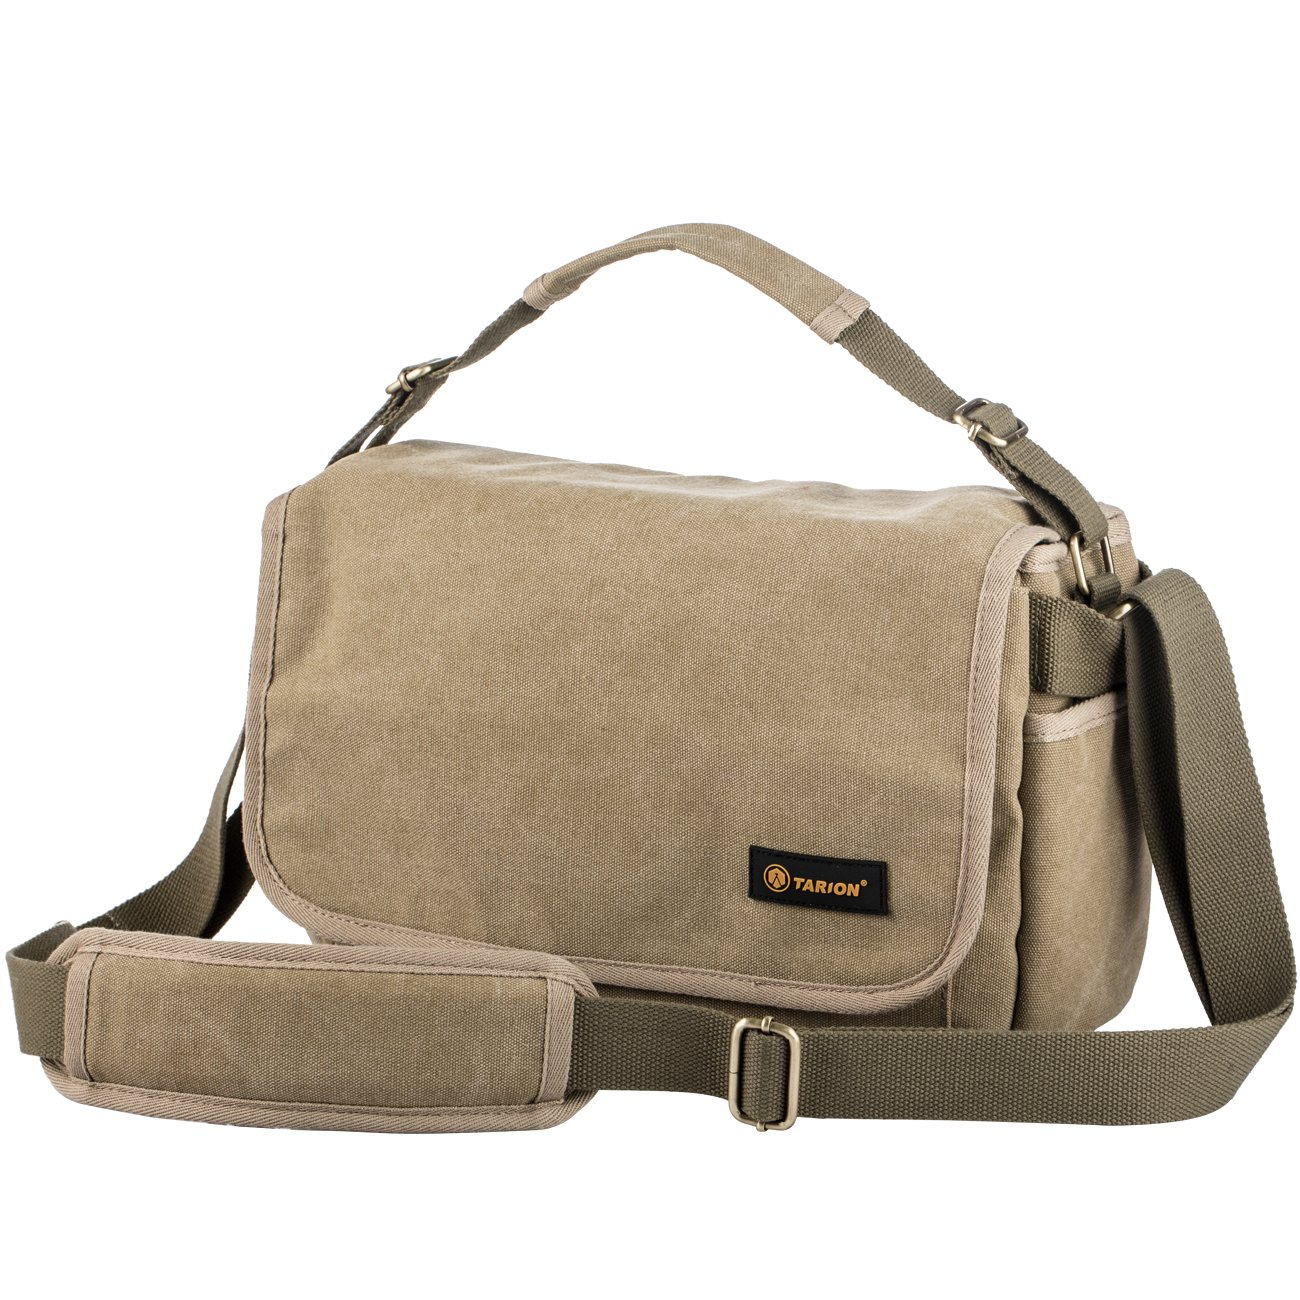 TARION RS-01 Camera Bag Shoulder Bag Case Water Repellent Canvas Massenger Bag DSLR Camera Mirrorless Yellow